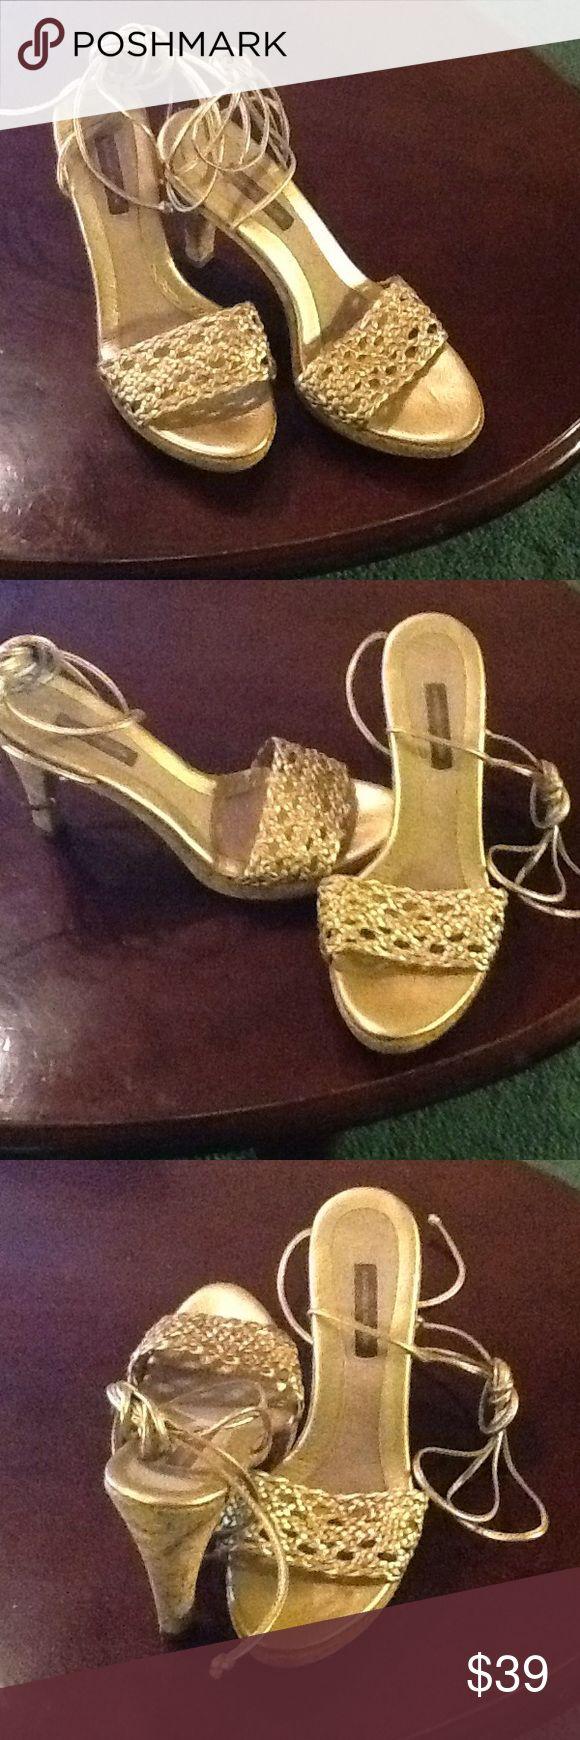 Antonio Melani Gladiator high Cork heel sandals ANTONIO MELANI GLADIATOR HIGH CORK HEEL GOLD SANDALS SIZE M PREOWNED GOOD CONDITION ANTONIO MELANI Shoes Heels